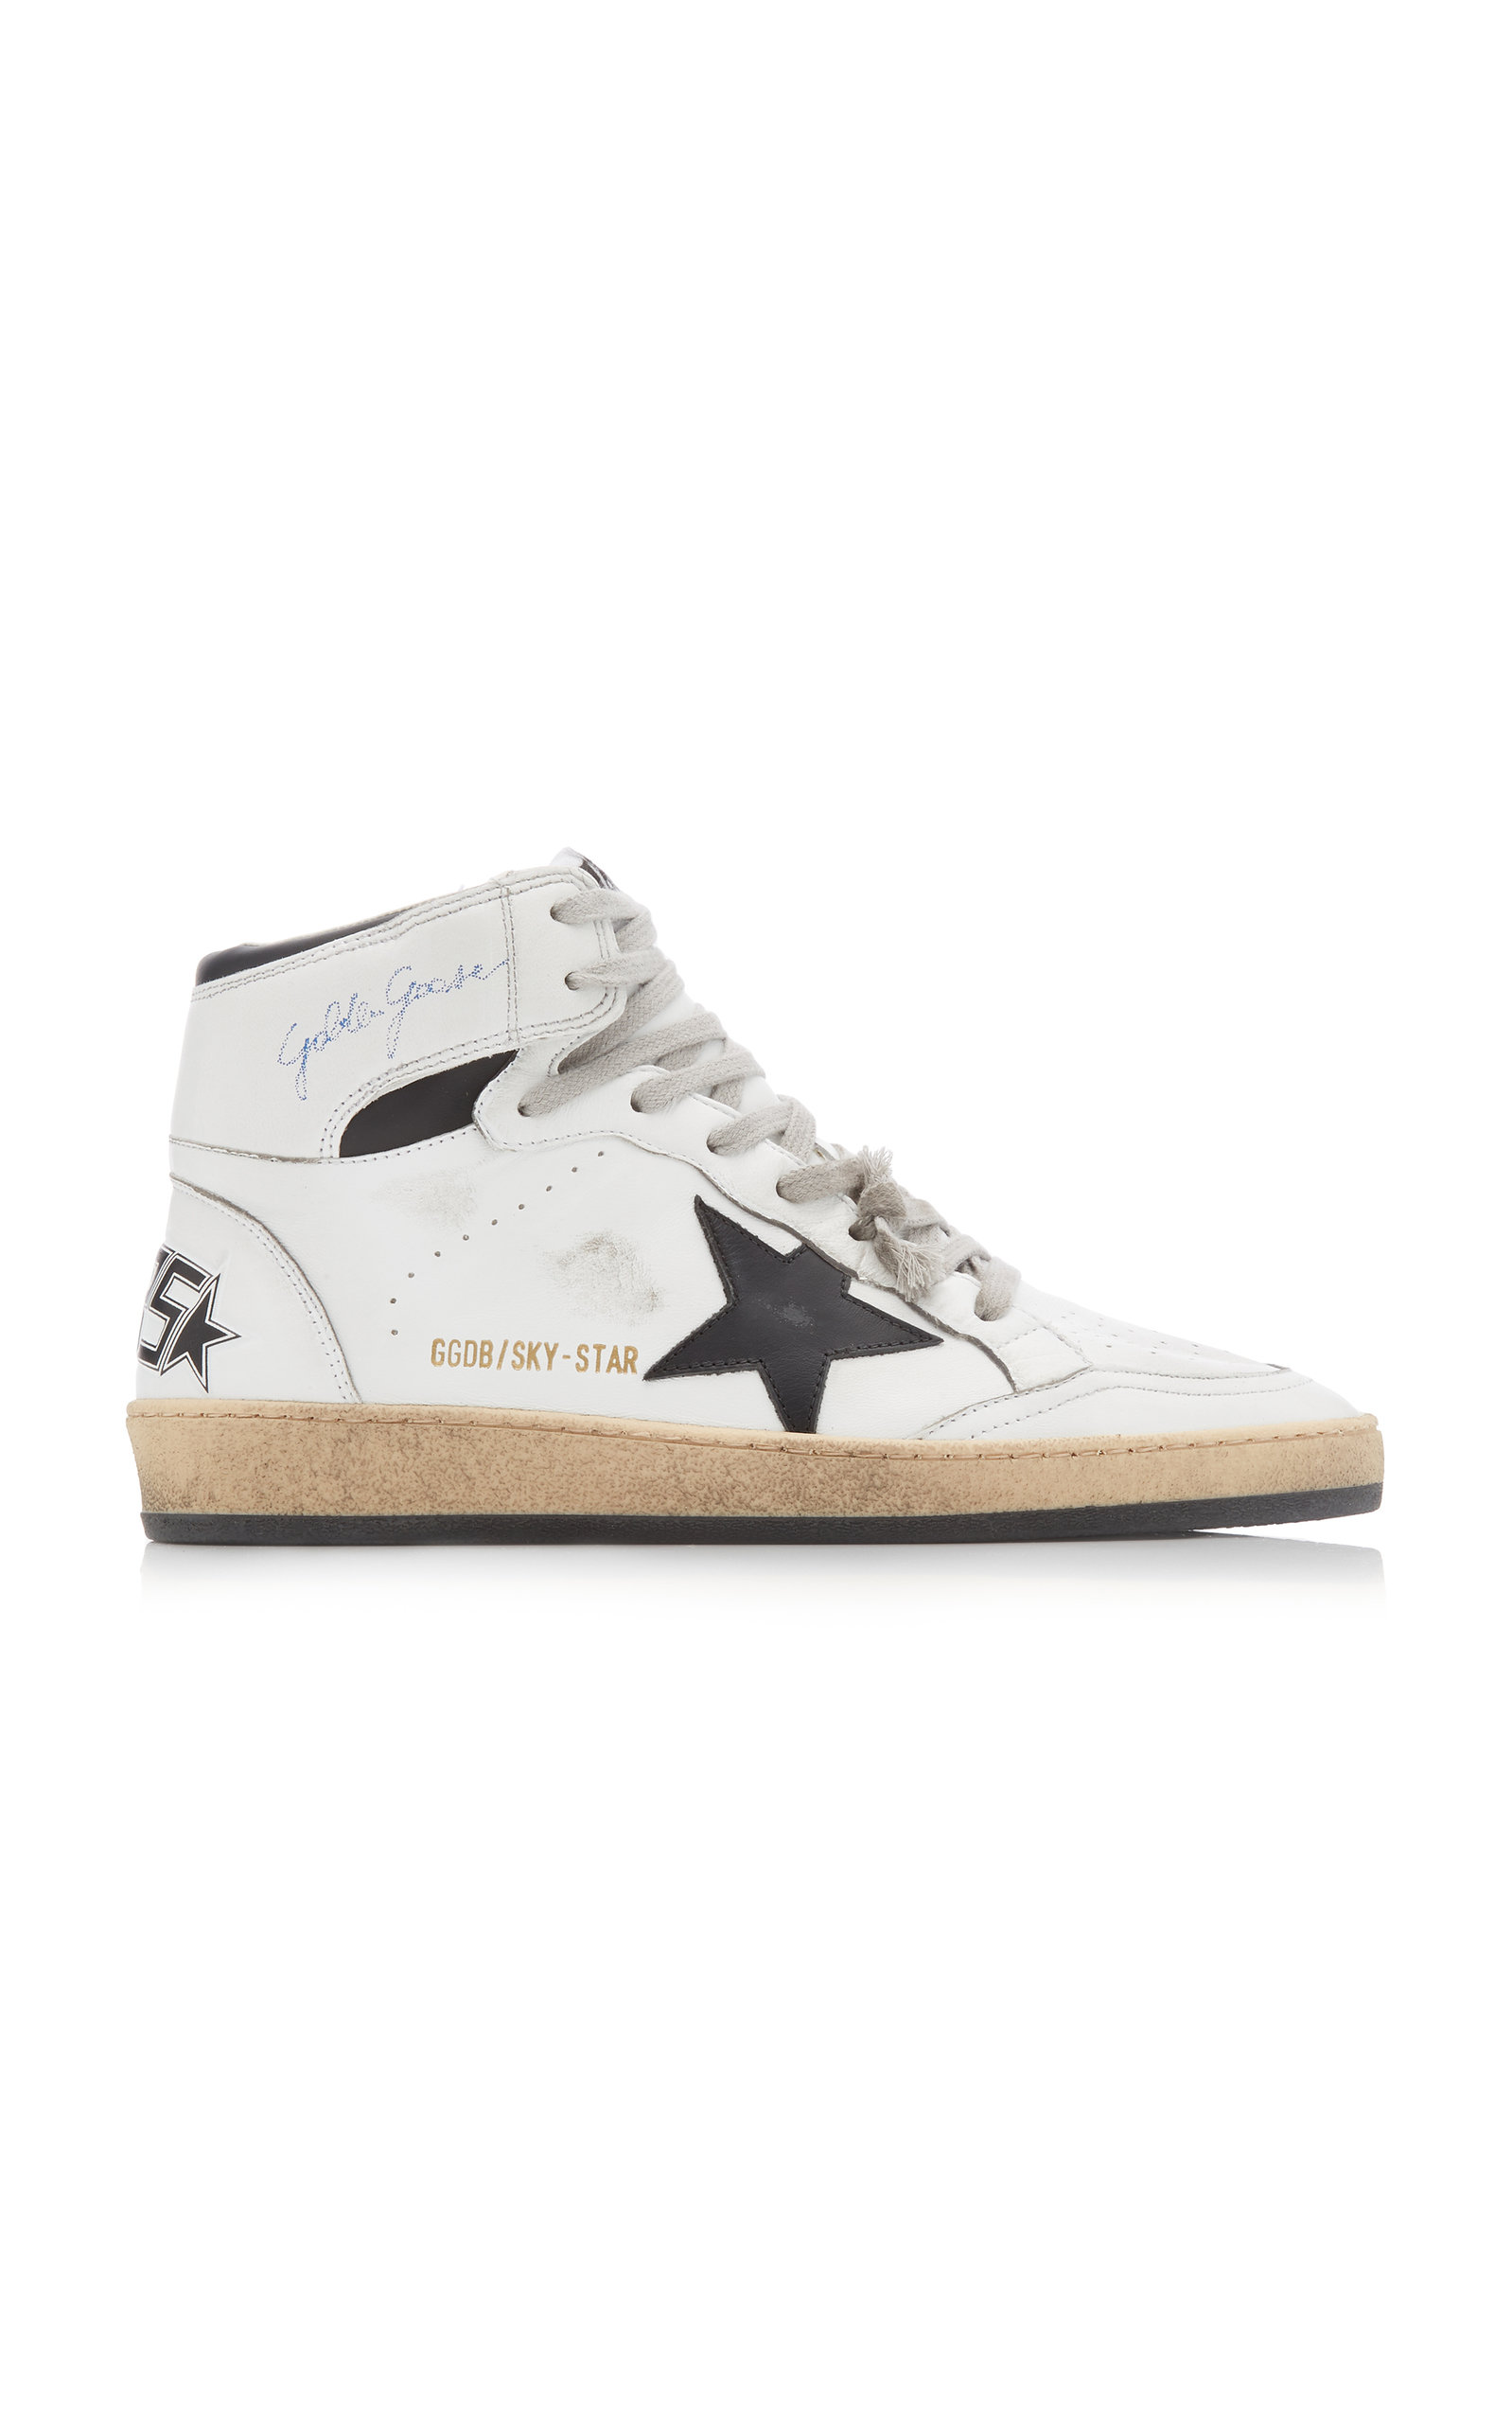 Golden Goose - Women's Sky Star Leather Sneakers - Black/white - Moda Operandi